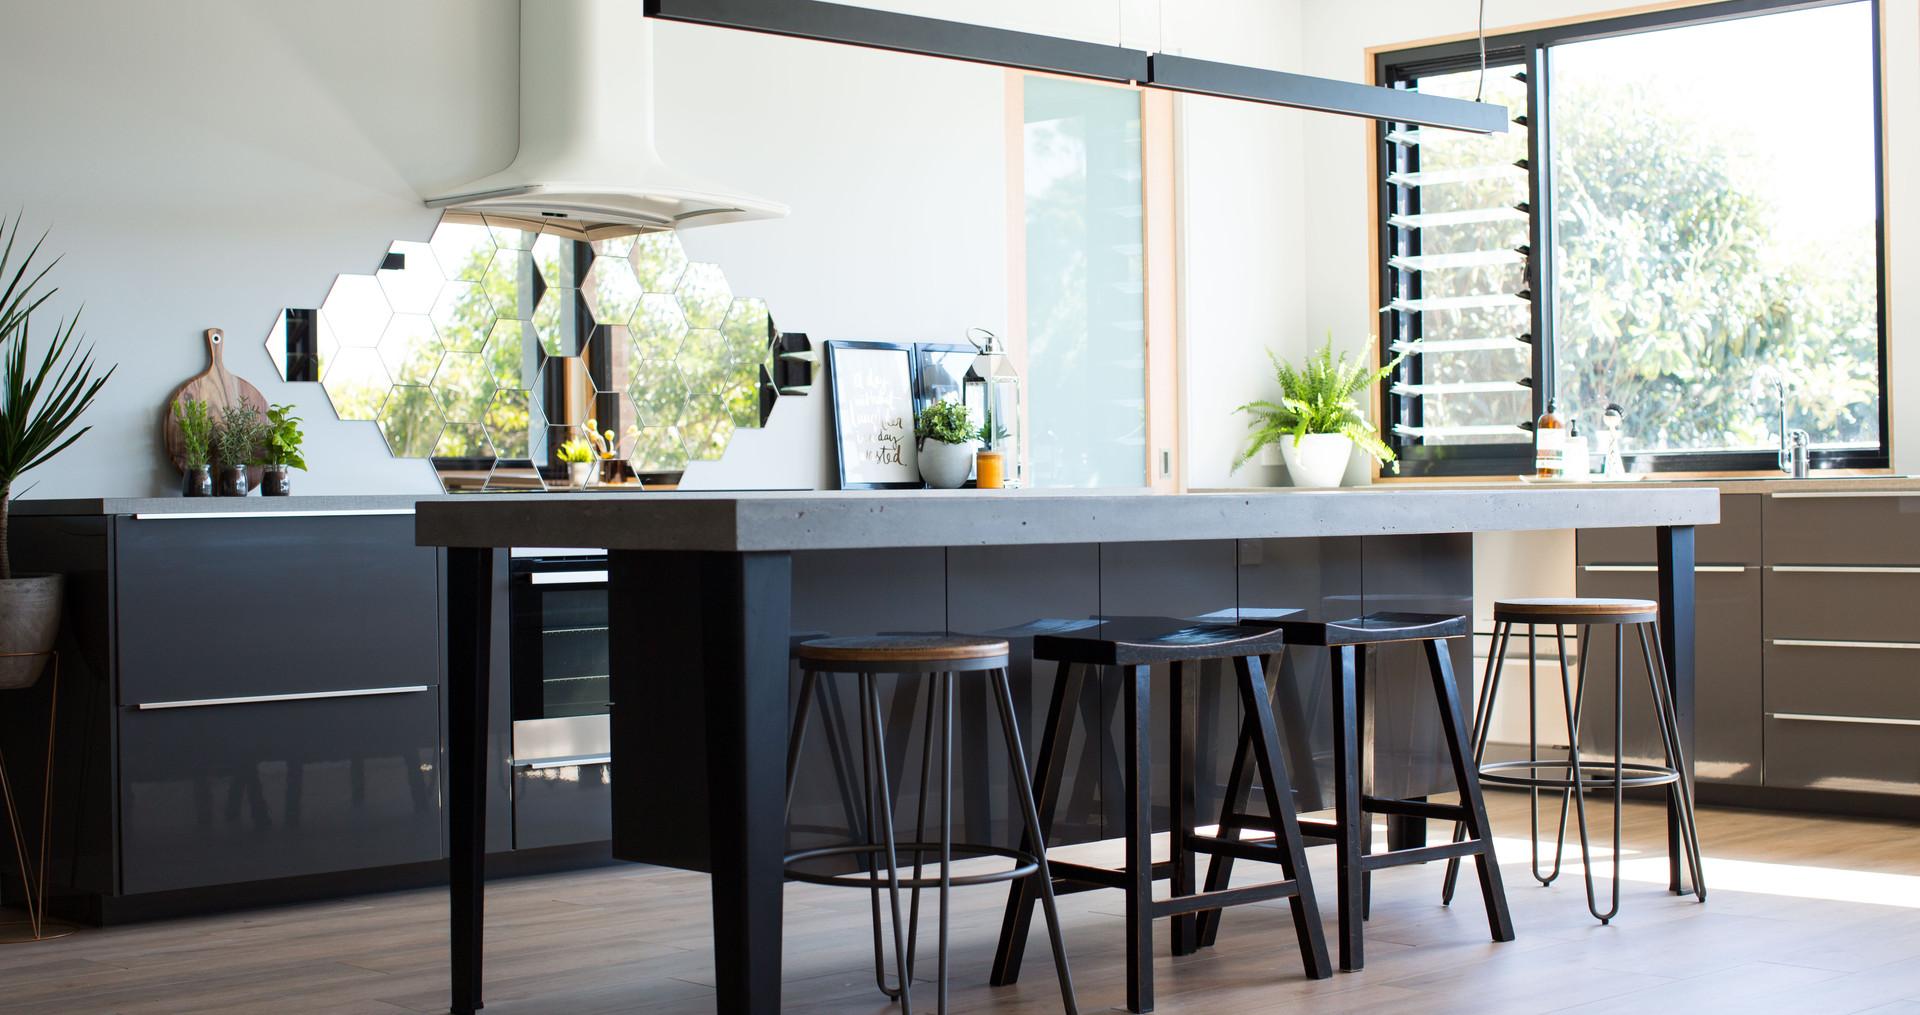 Concrete Kitchen Island with Steel Legs